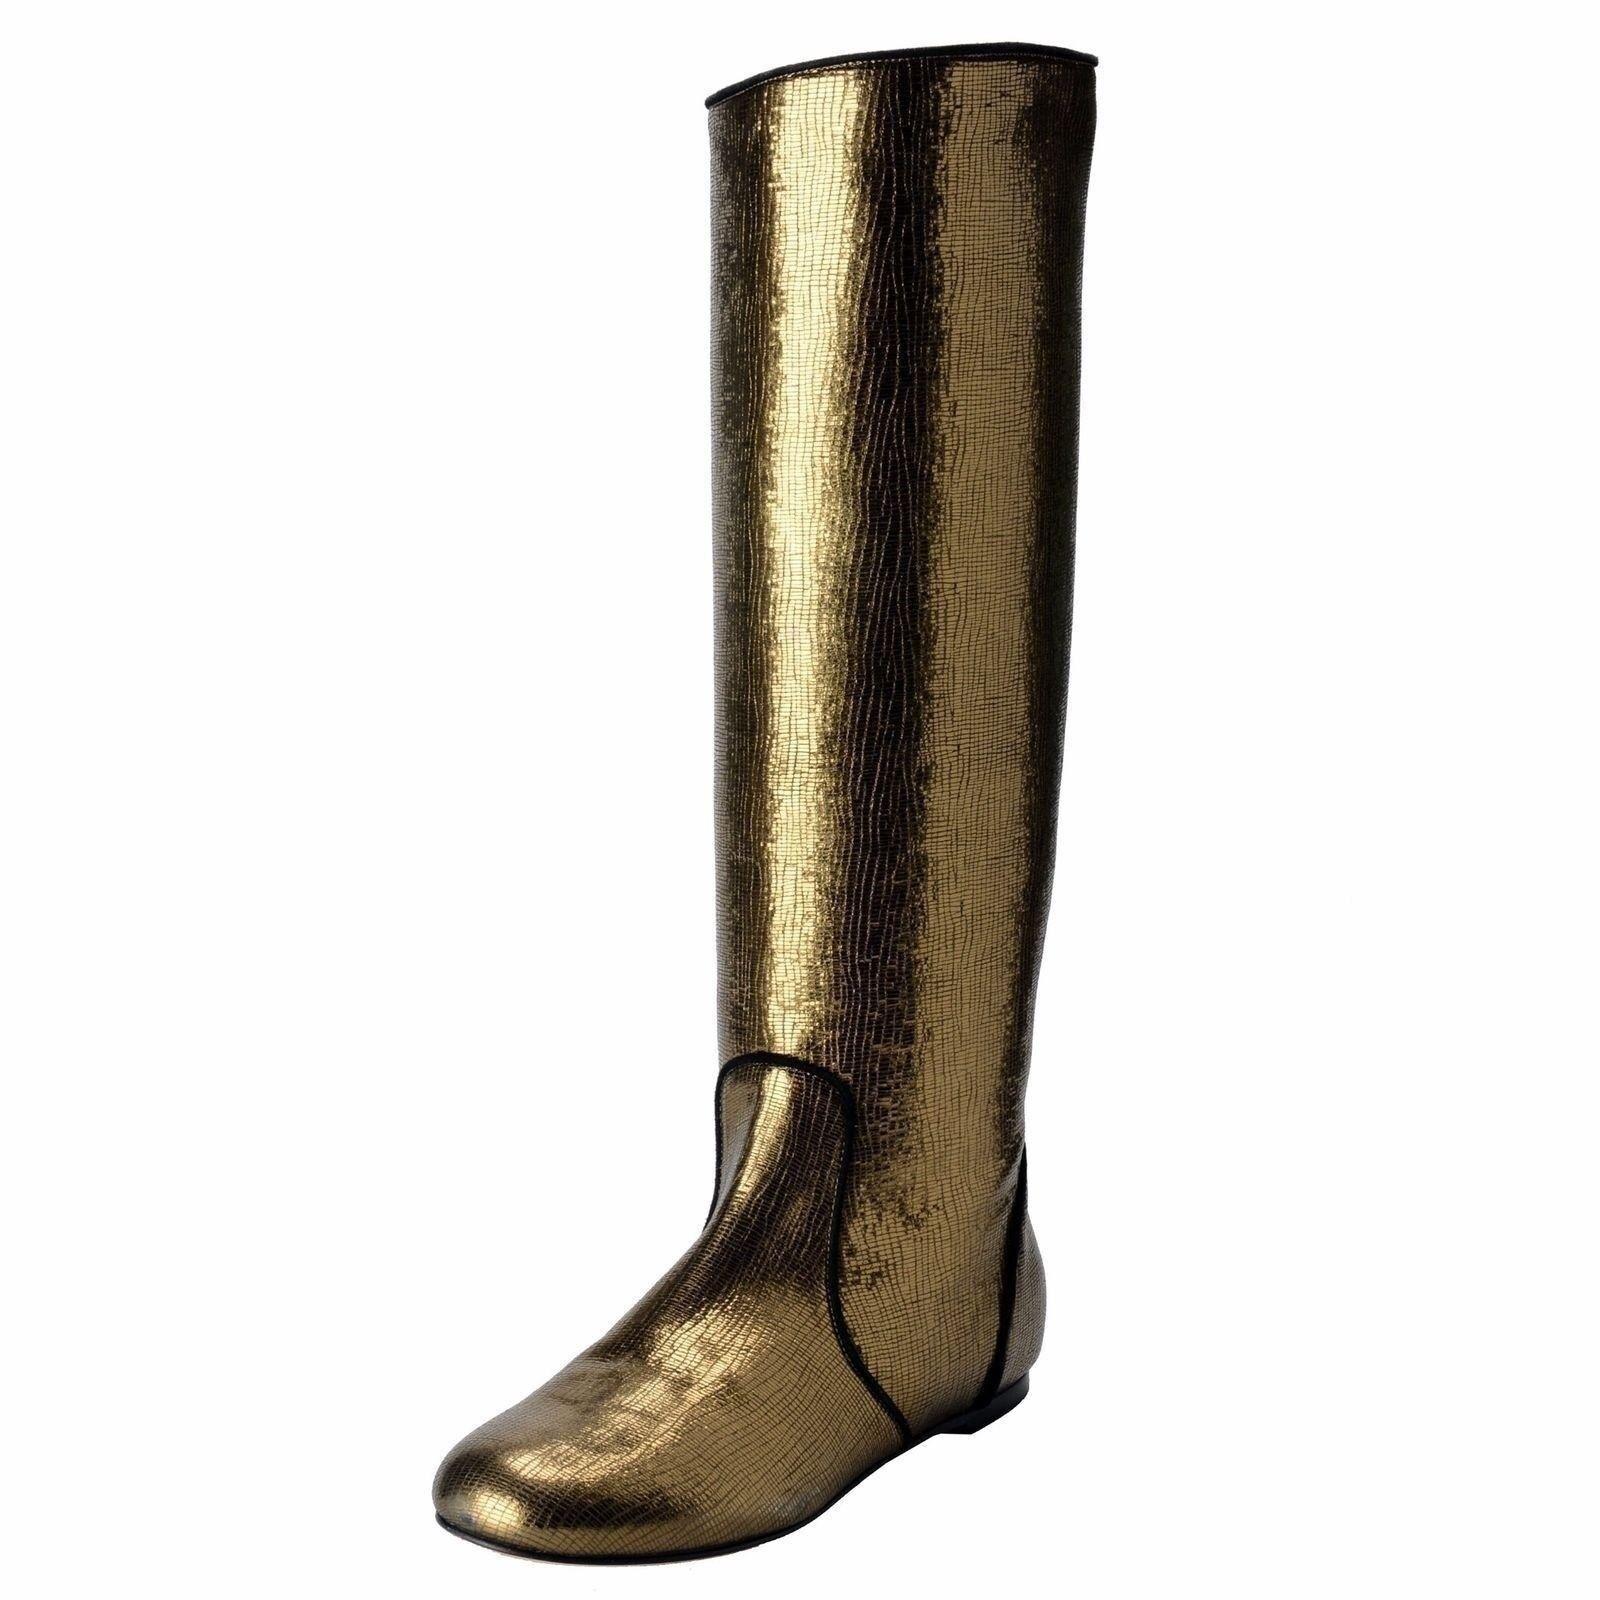 Giuseppe Zanotti Design Damen Leder GelbGolden Grün Flach Stiefel Schuhe US 6 It